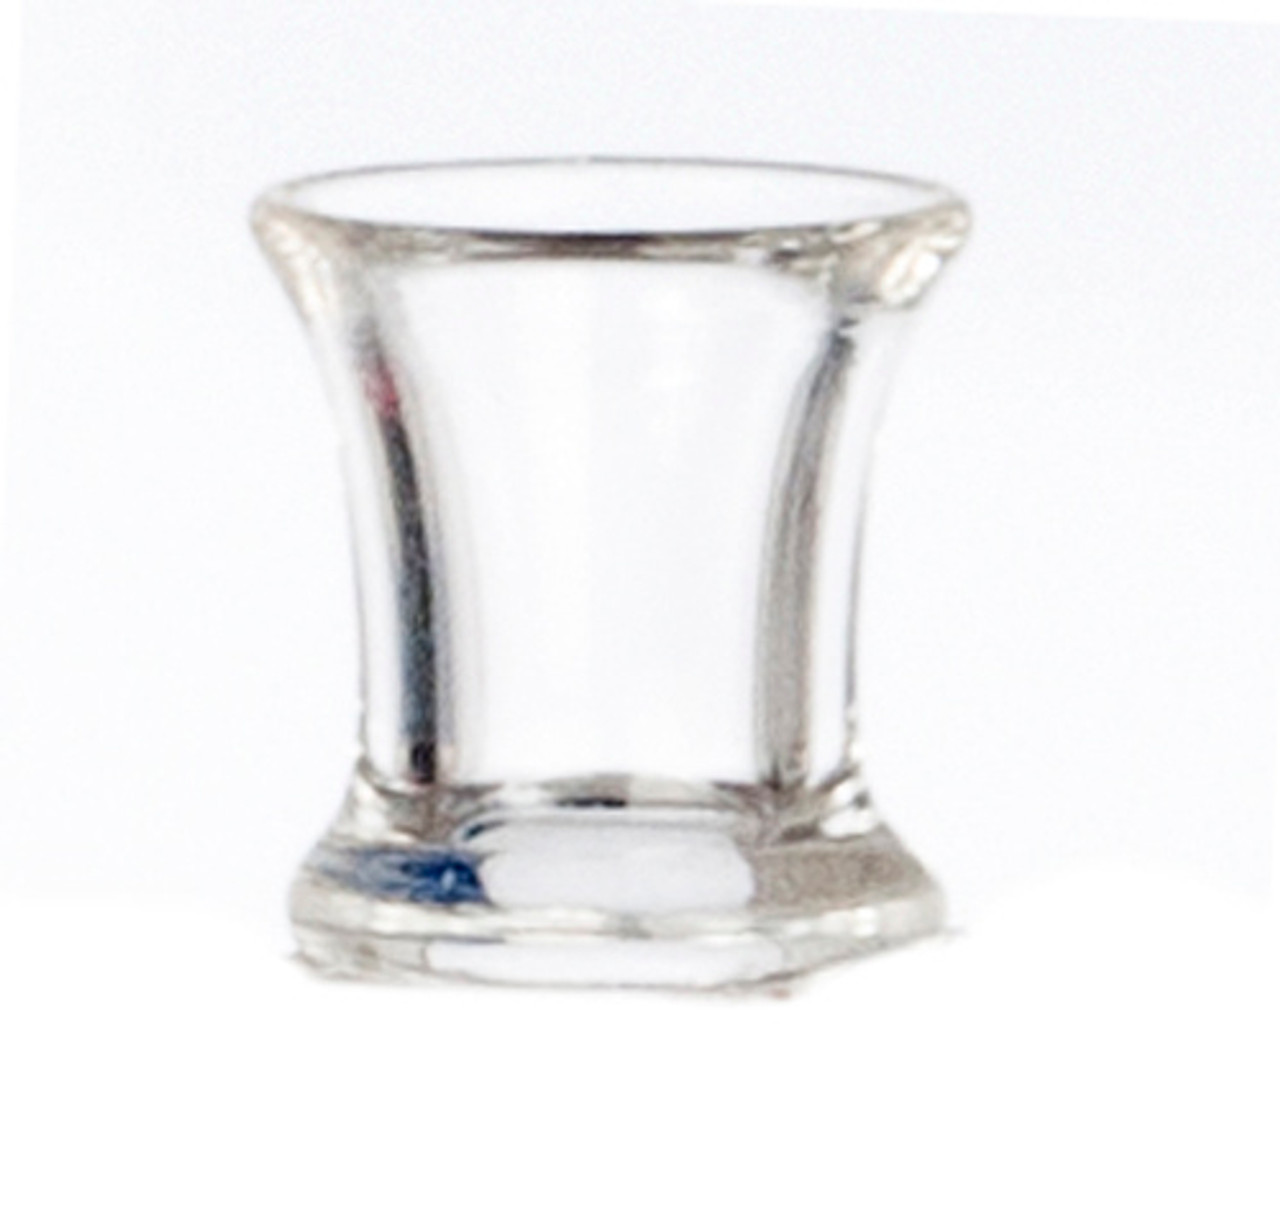 Dollhouse City - Dollhouse Miniatures Drinking Glass